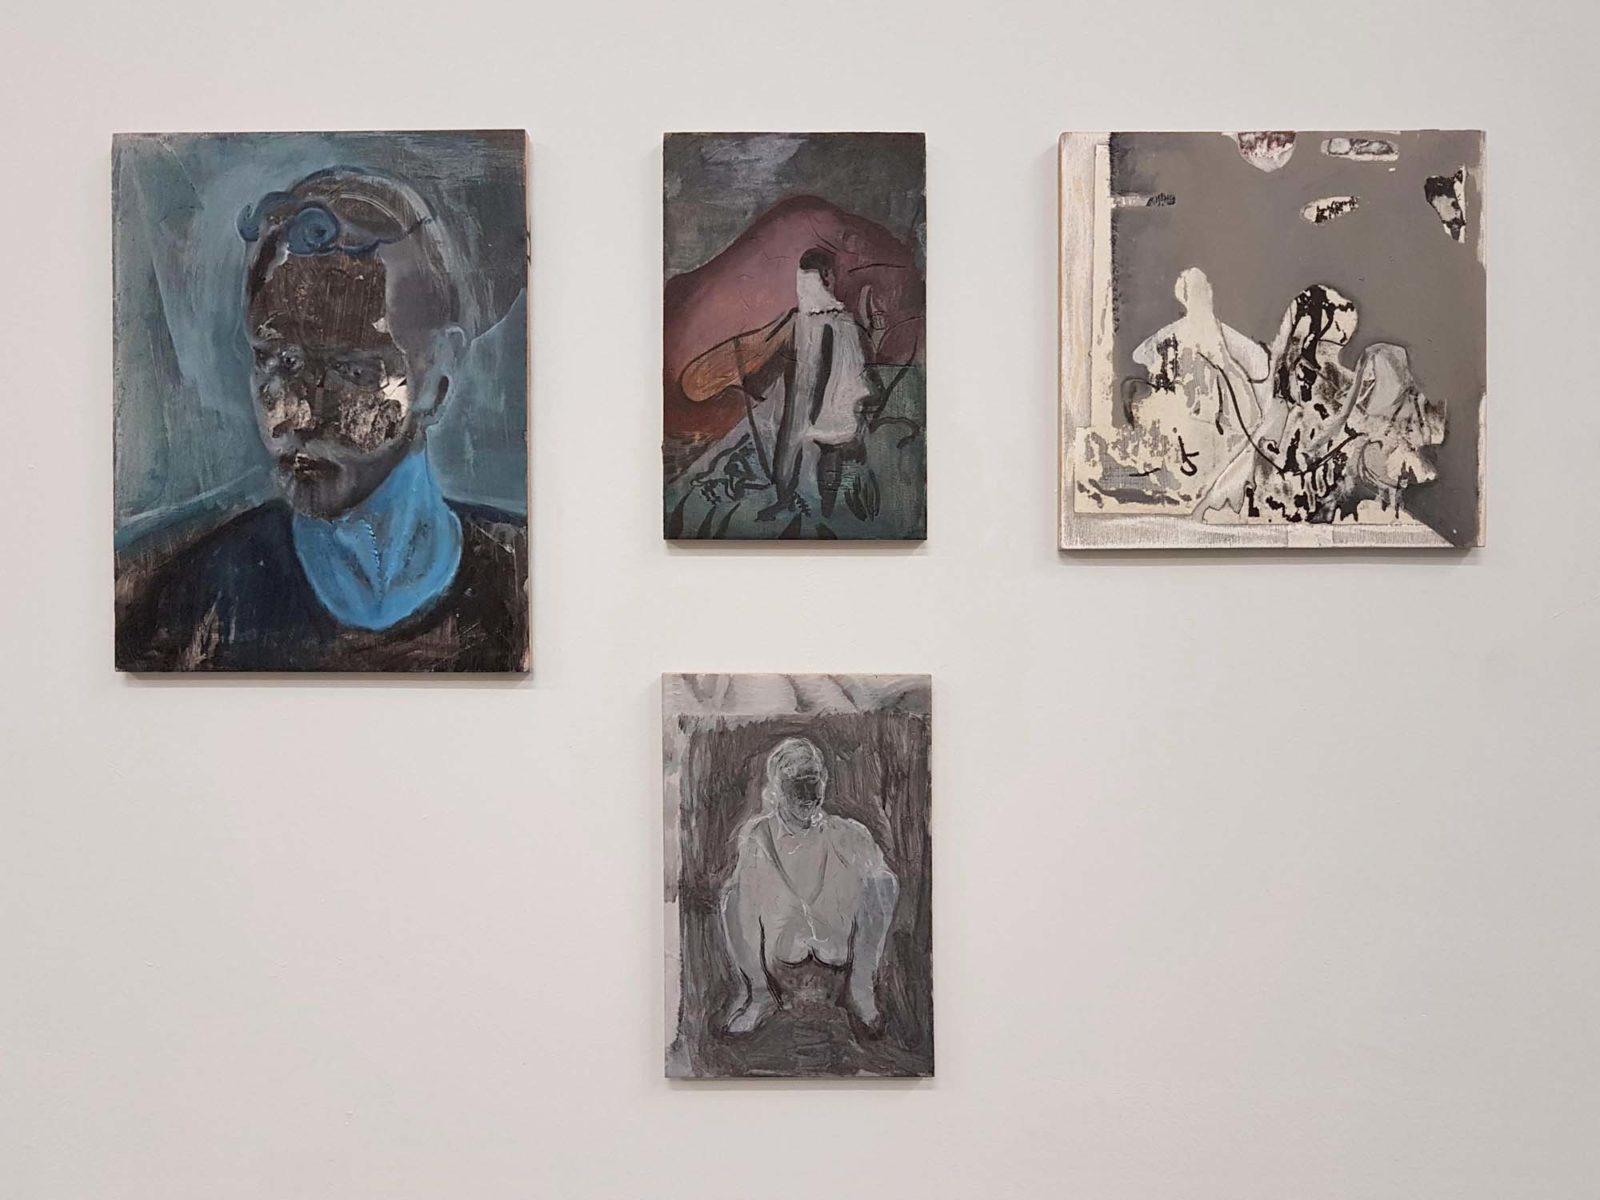 Nebojša Despotović, Between the devil and the deep blue sea ovvero freie Kartoffeln, 2018, Boccanera Galllery, Trento